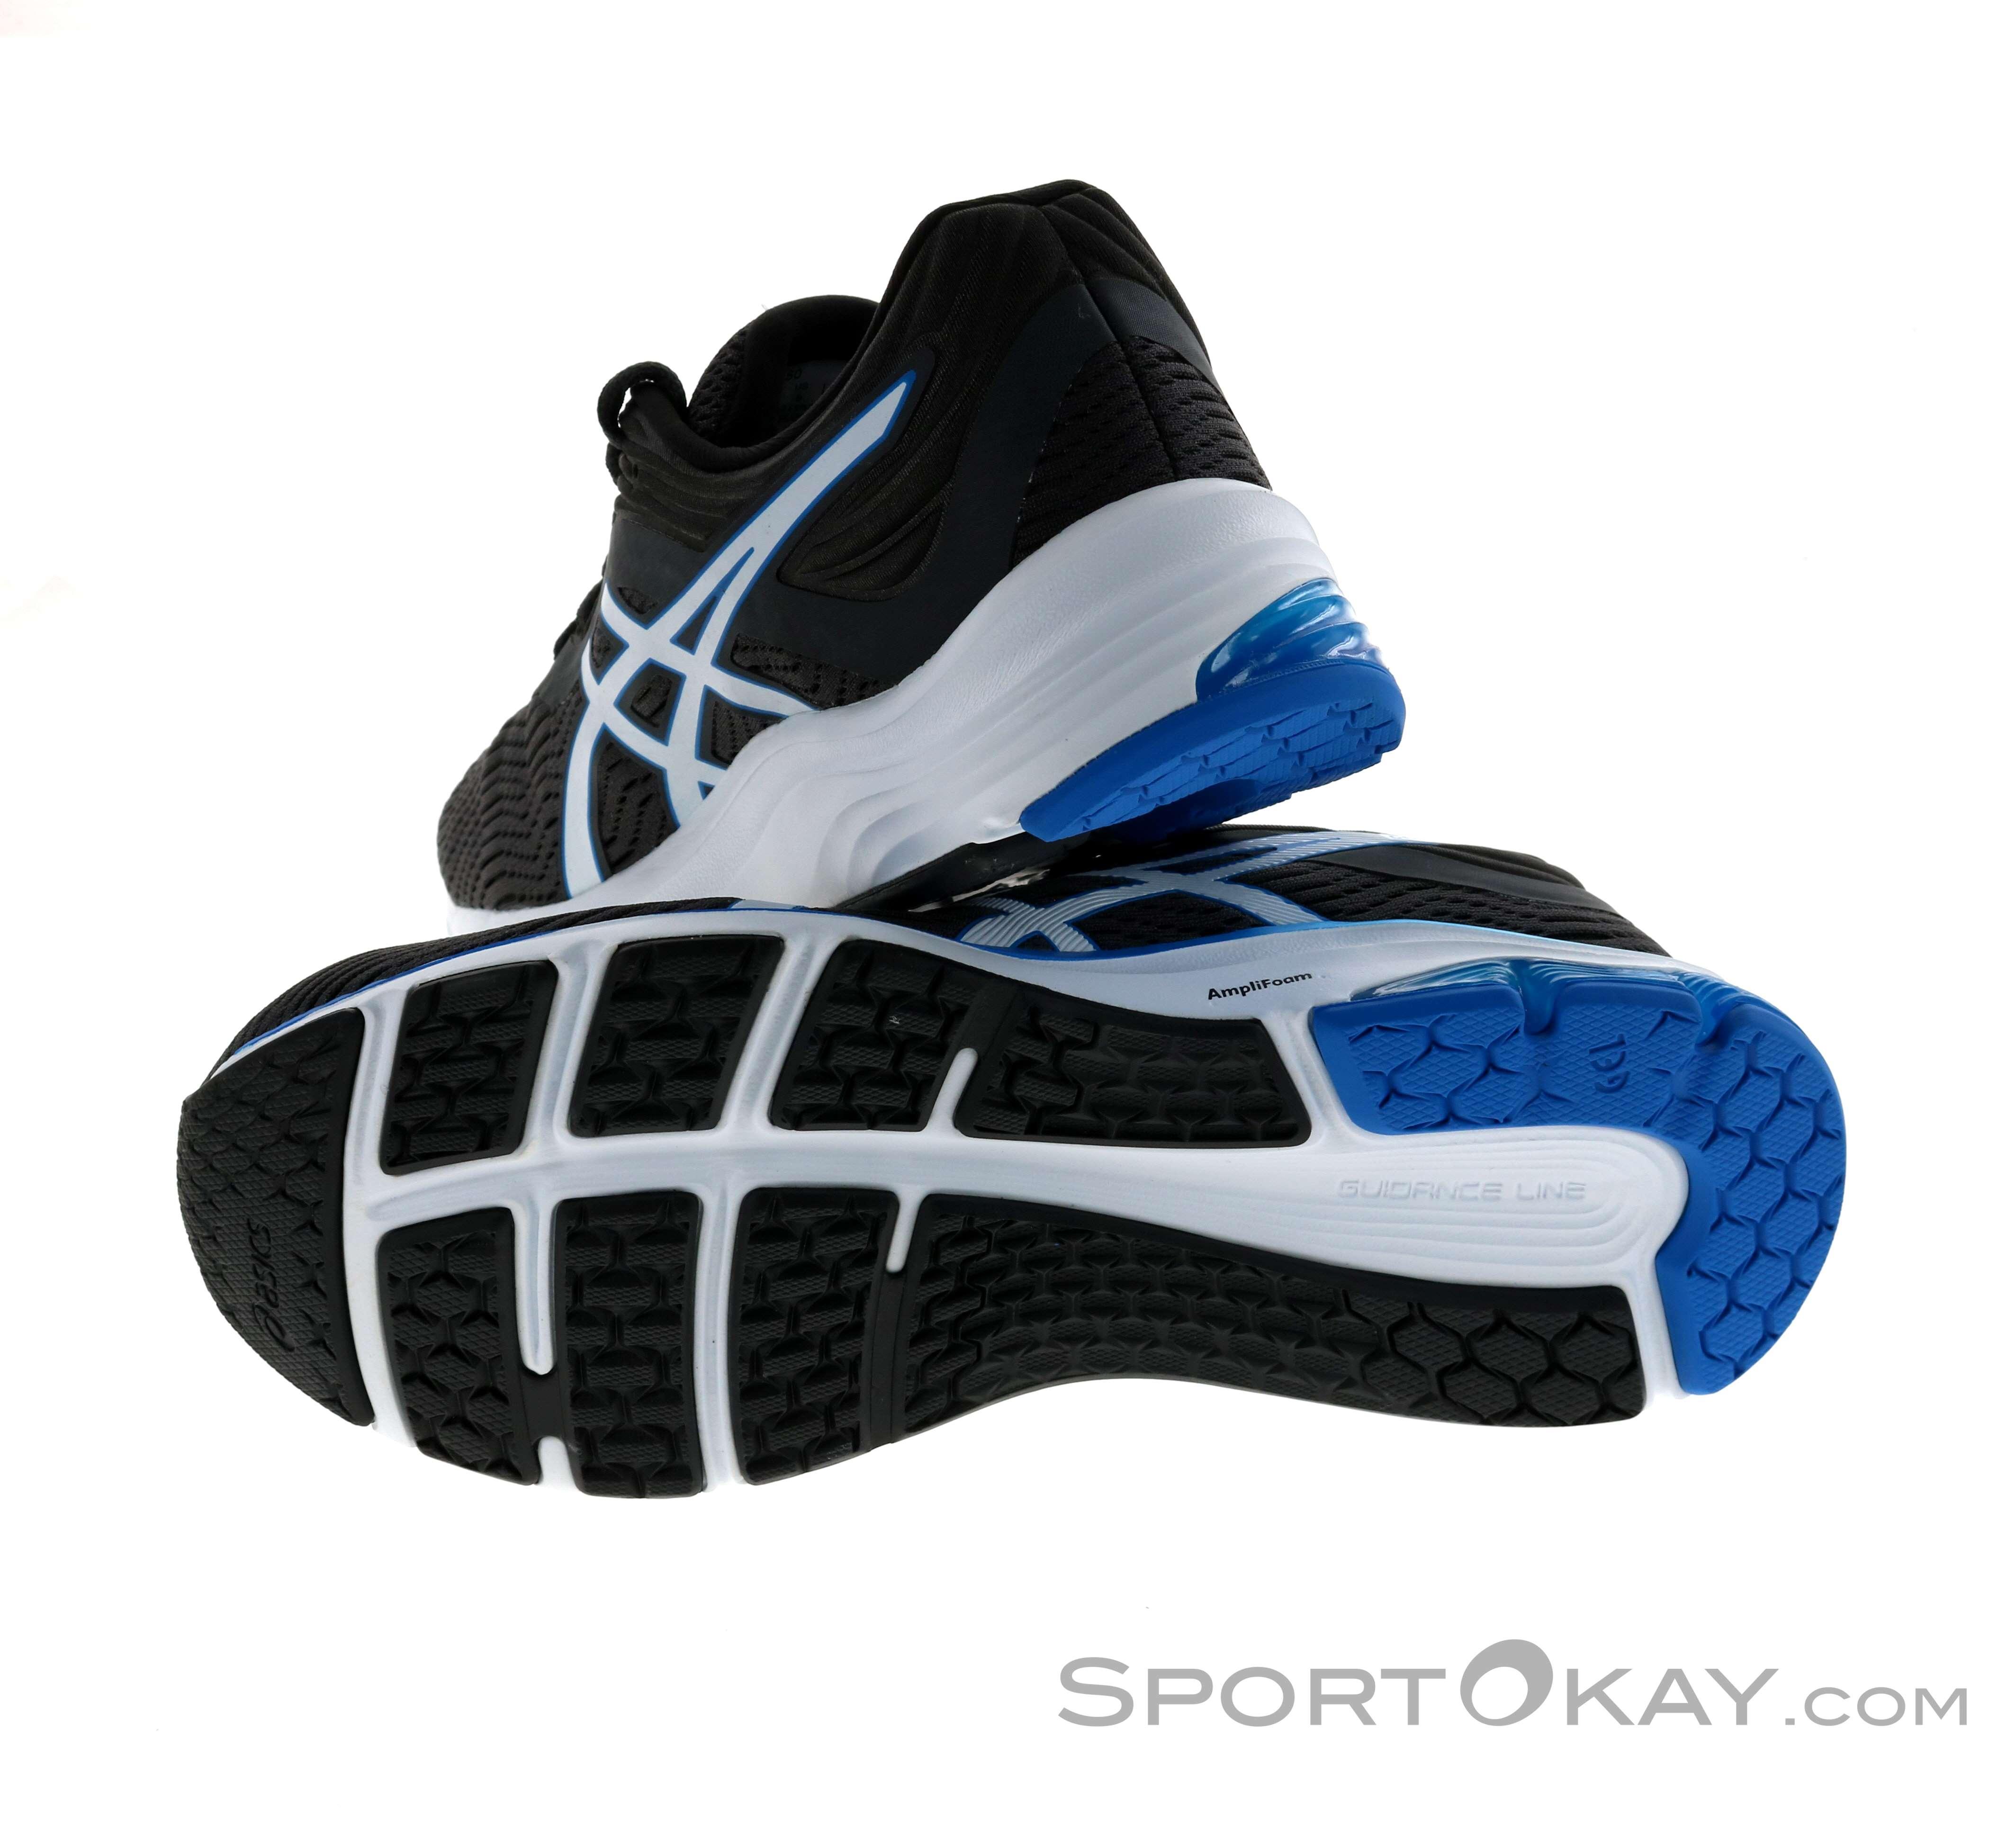 Asics Asics Gel Pulse 11 Mens Running Shoes